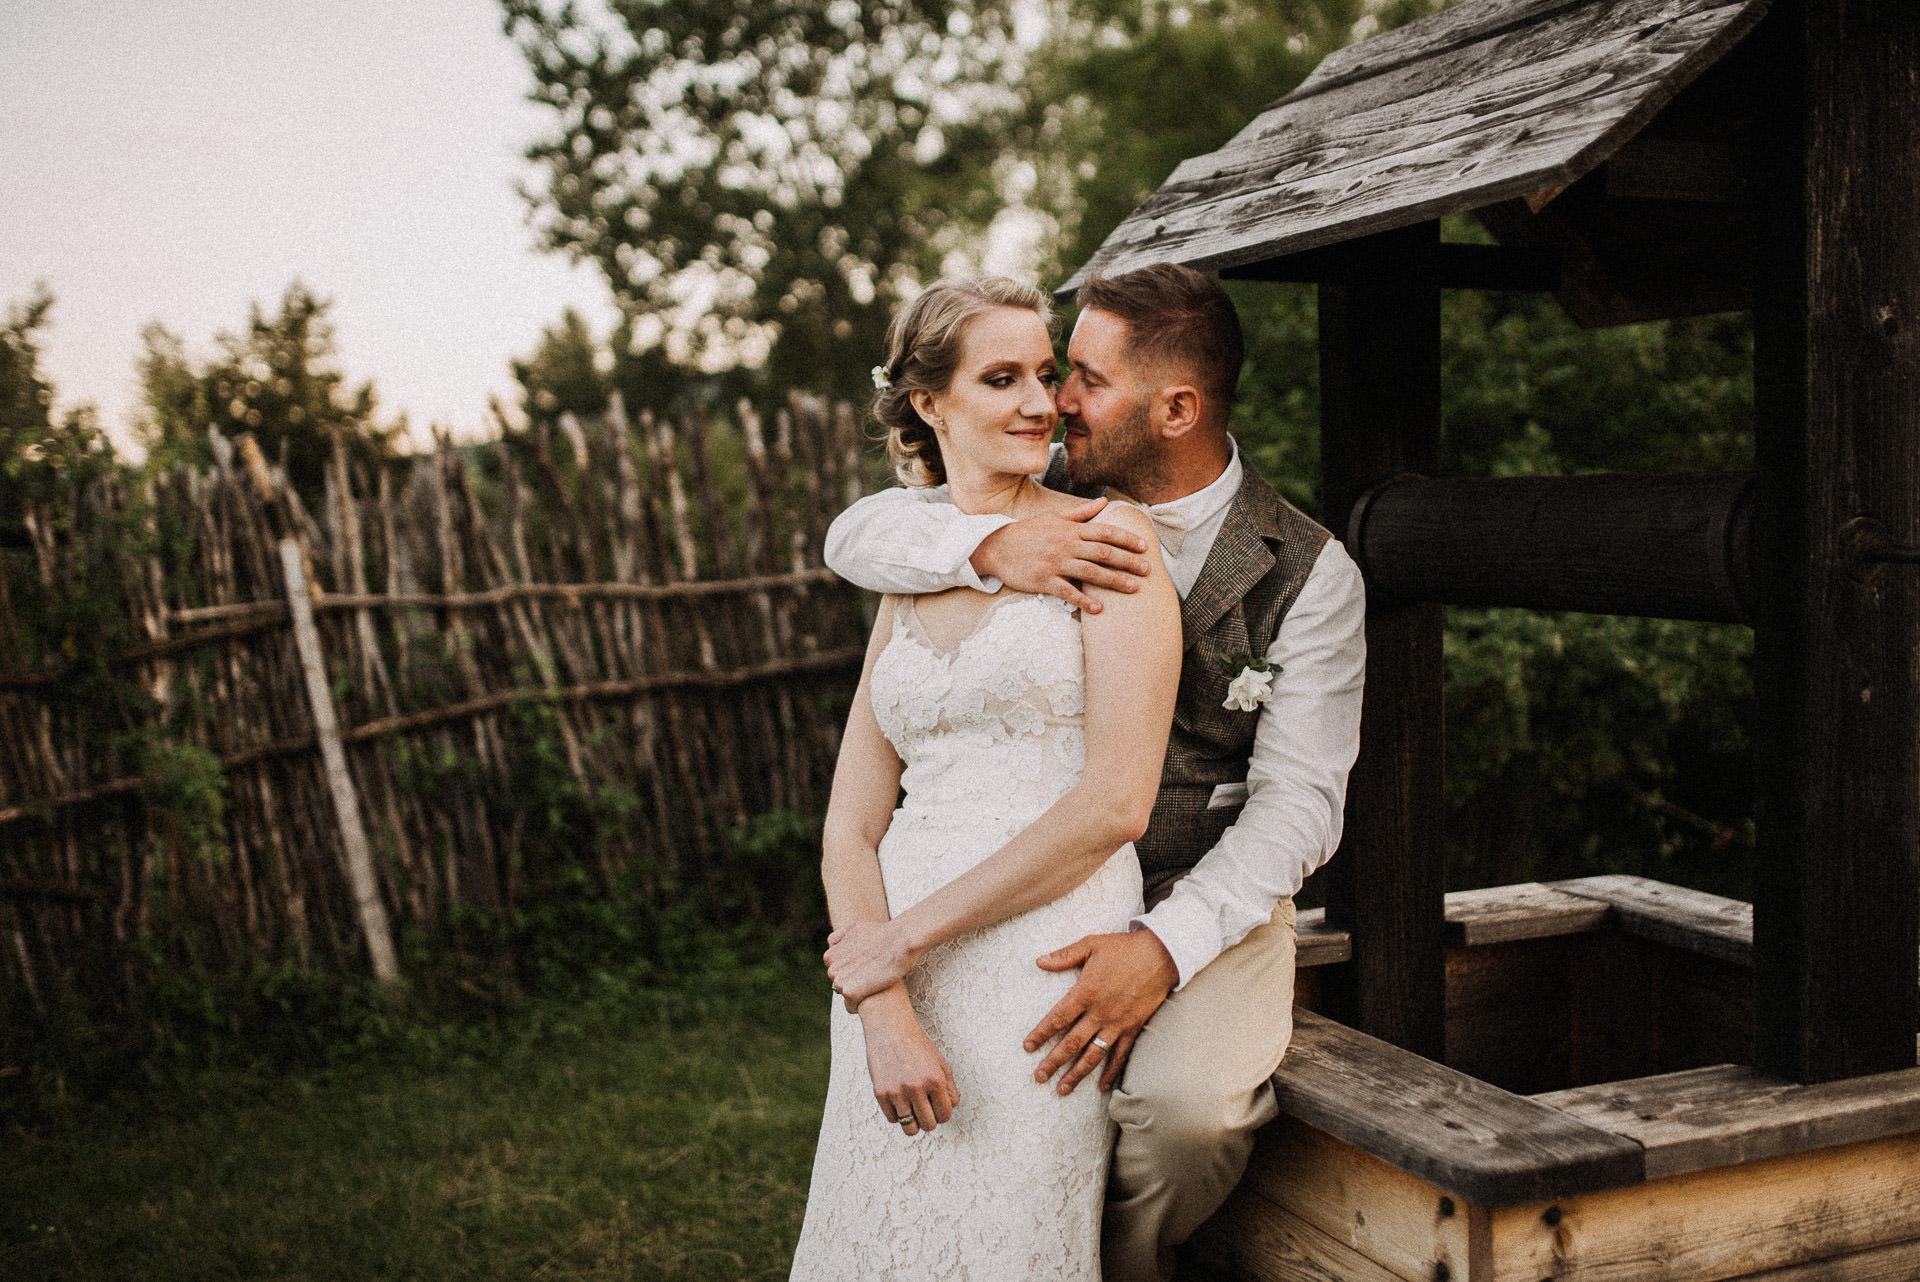 menyasszony volegeny bride groom oleles hug intimate meghitt eskuvo wedding galeria gallery kut well